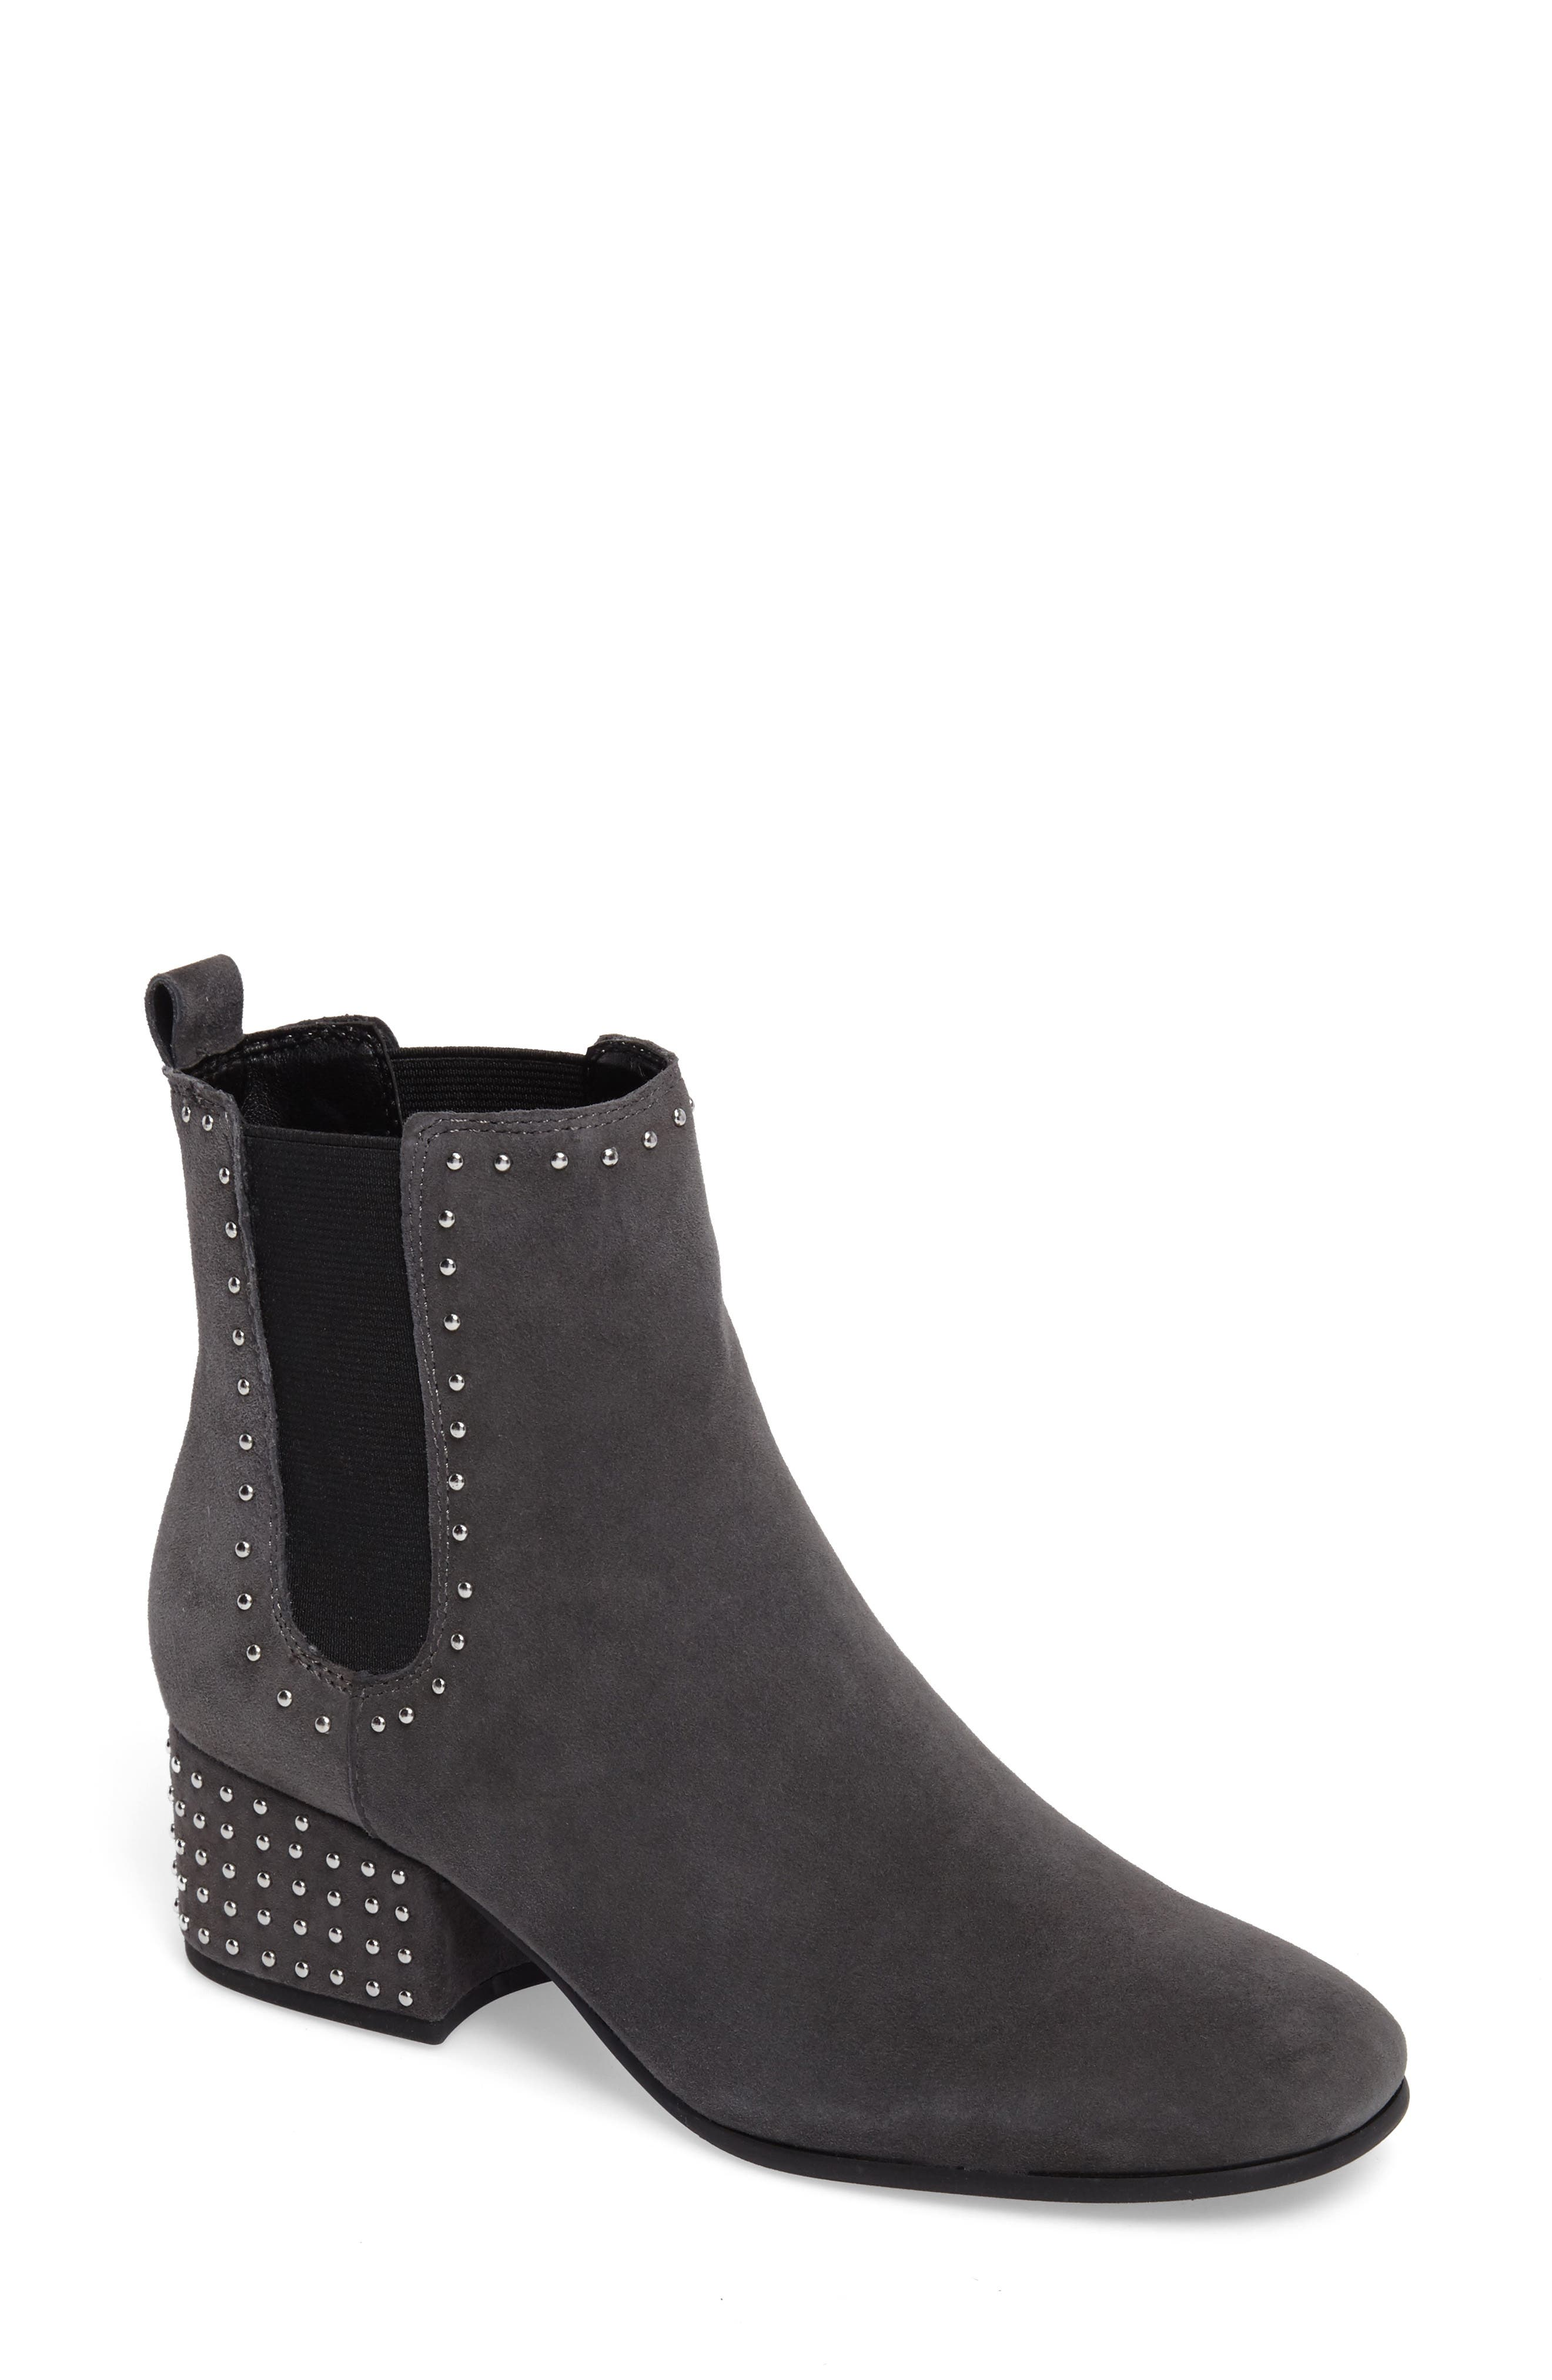 Alternate Image 1 Selected - Marc Fisher LTD Tango Chelsea Boot (Women)